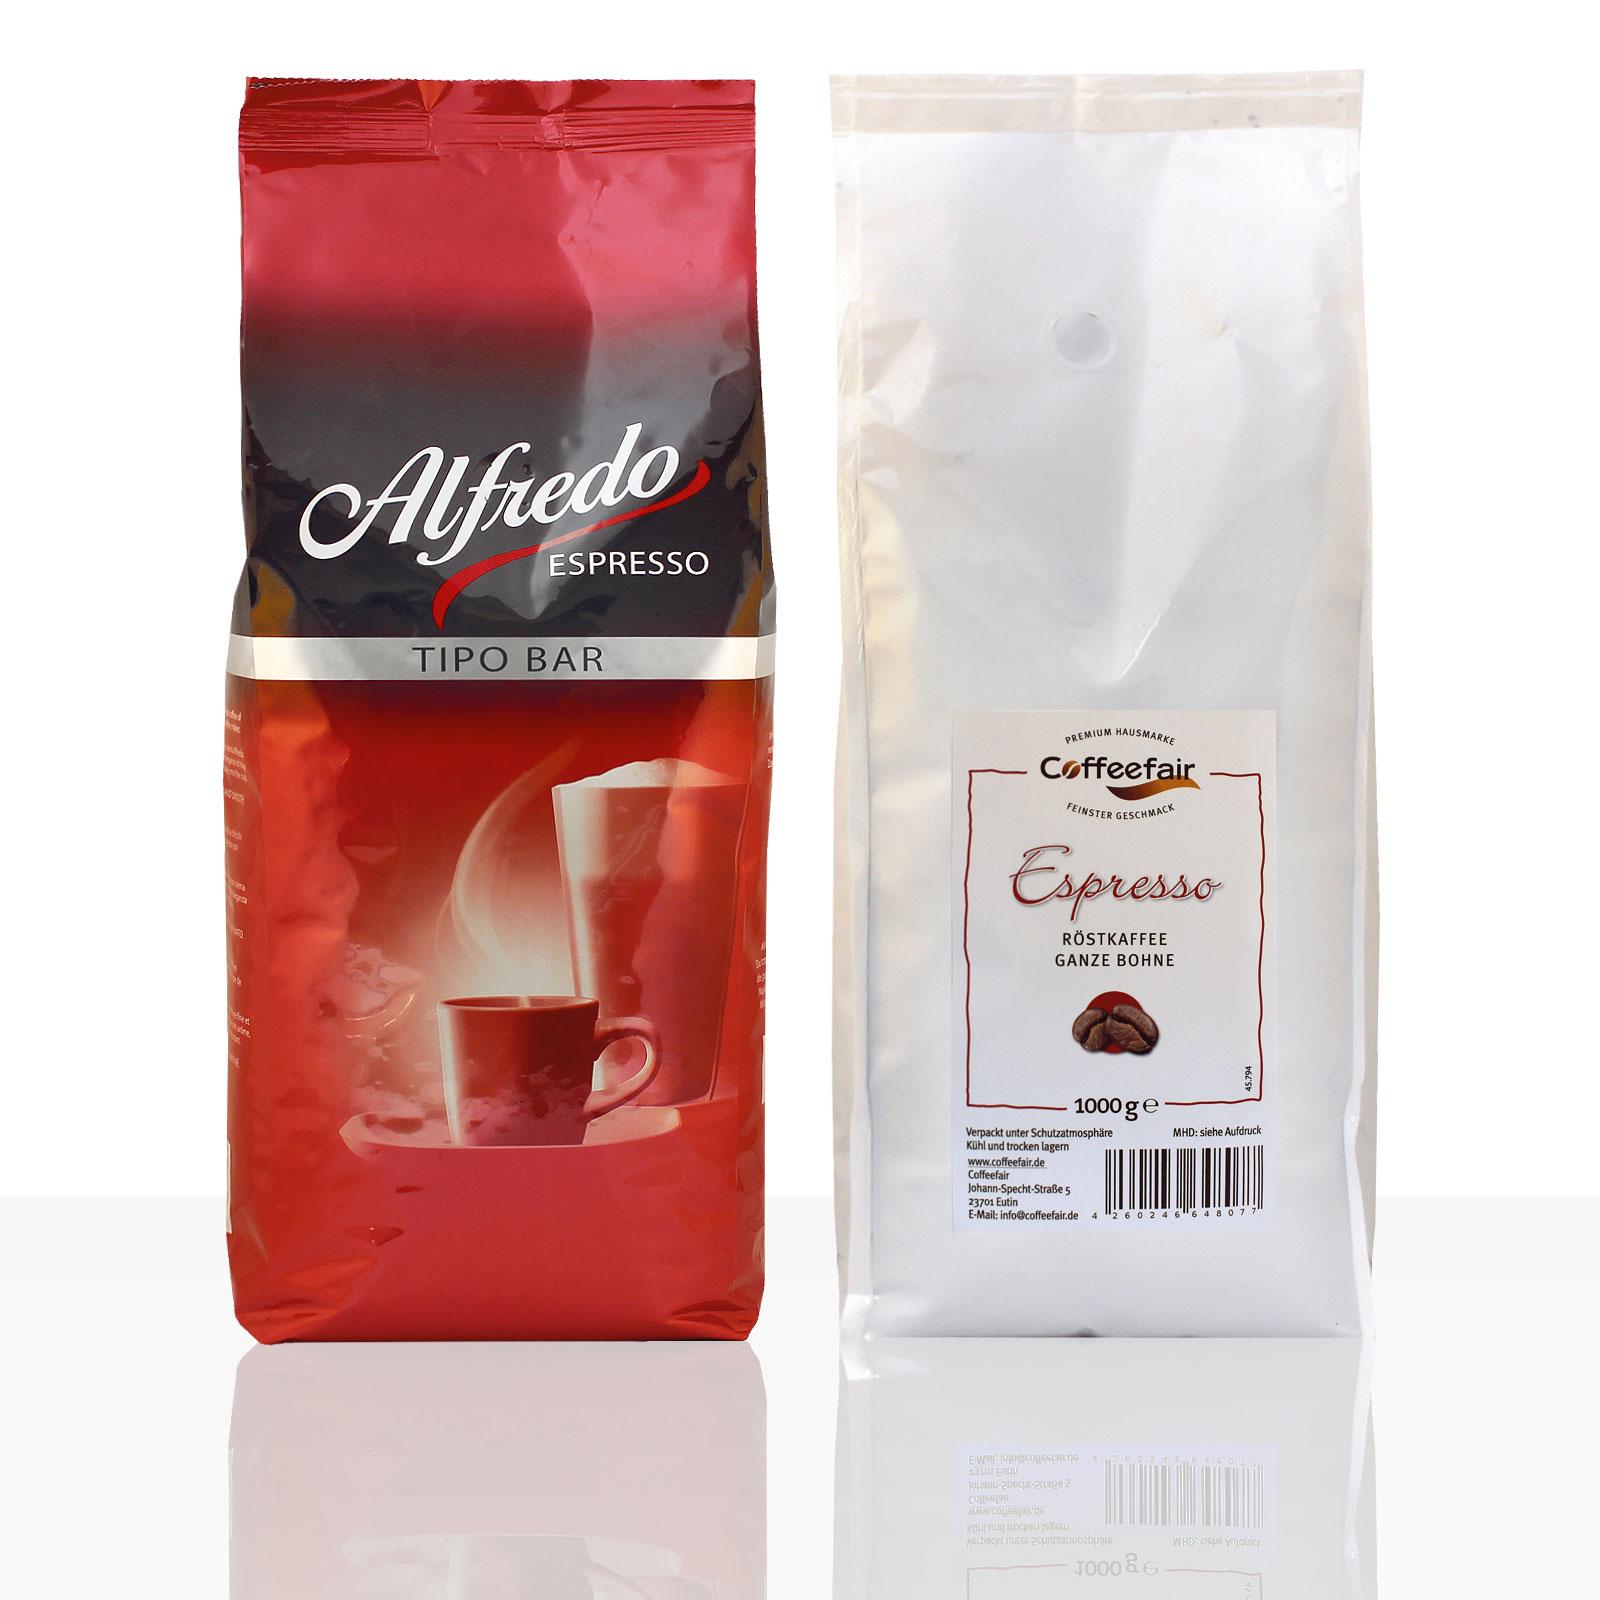 Darboven Alfredo Tipo Bar Espresso 6 x 1kg + Coffeefair Espresso 1kg Bohne